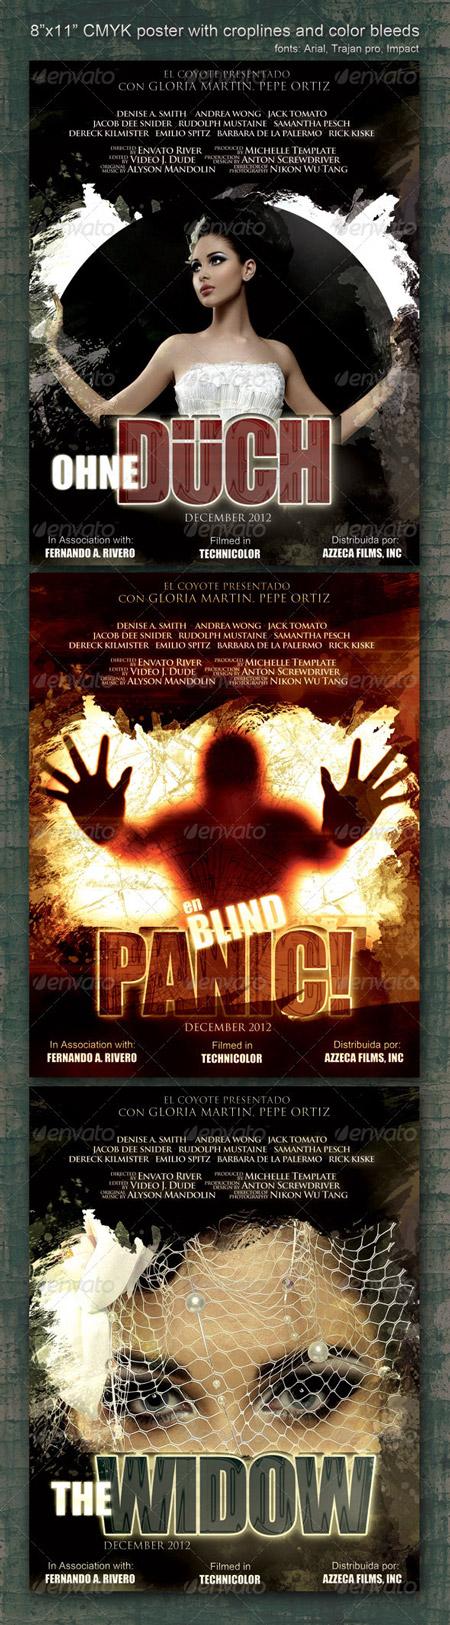 Graphicriver 8.5x11 Poster Panic